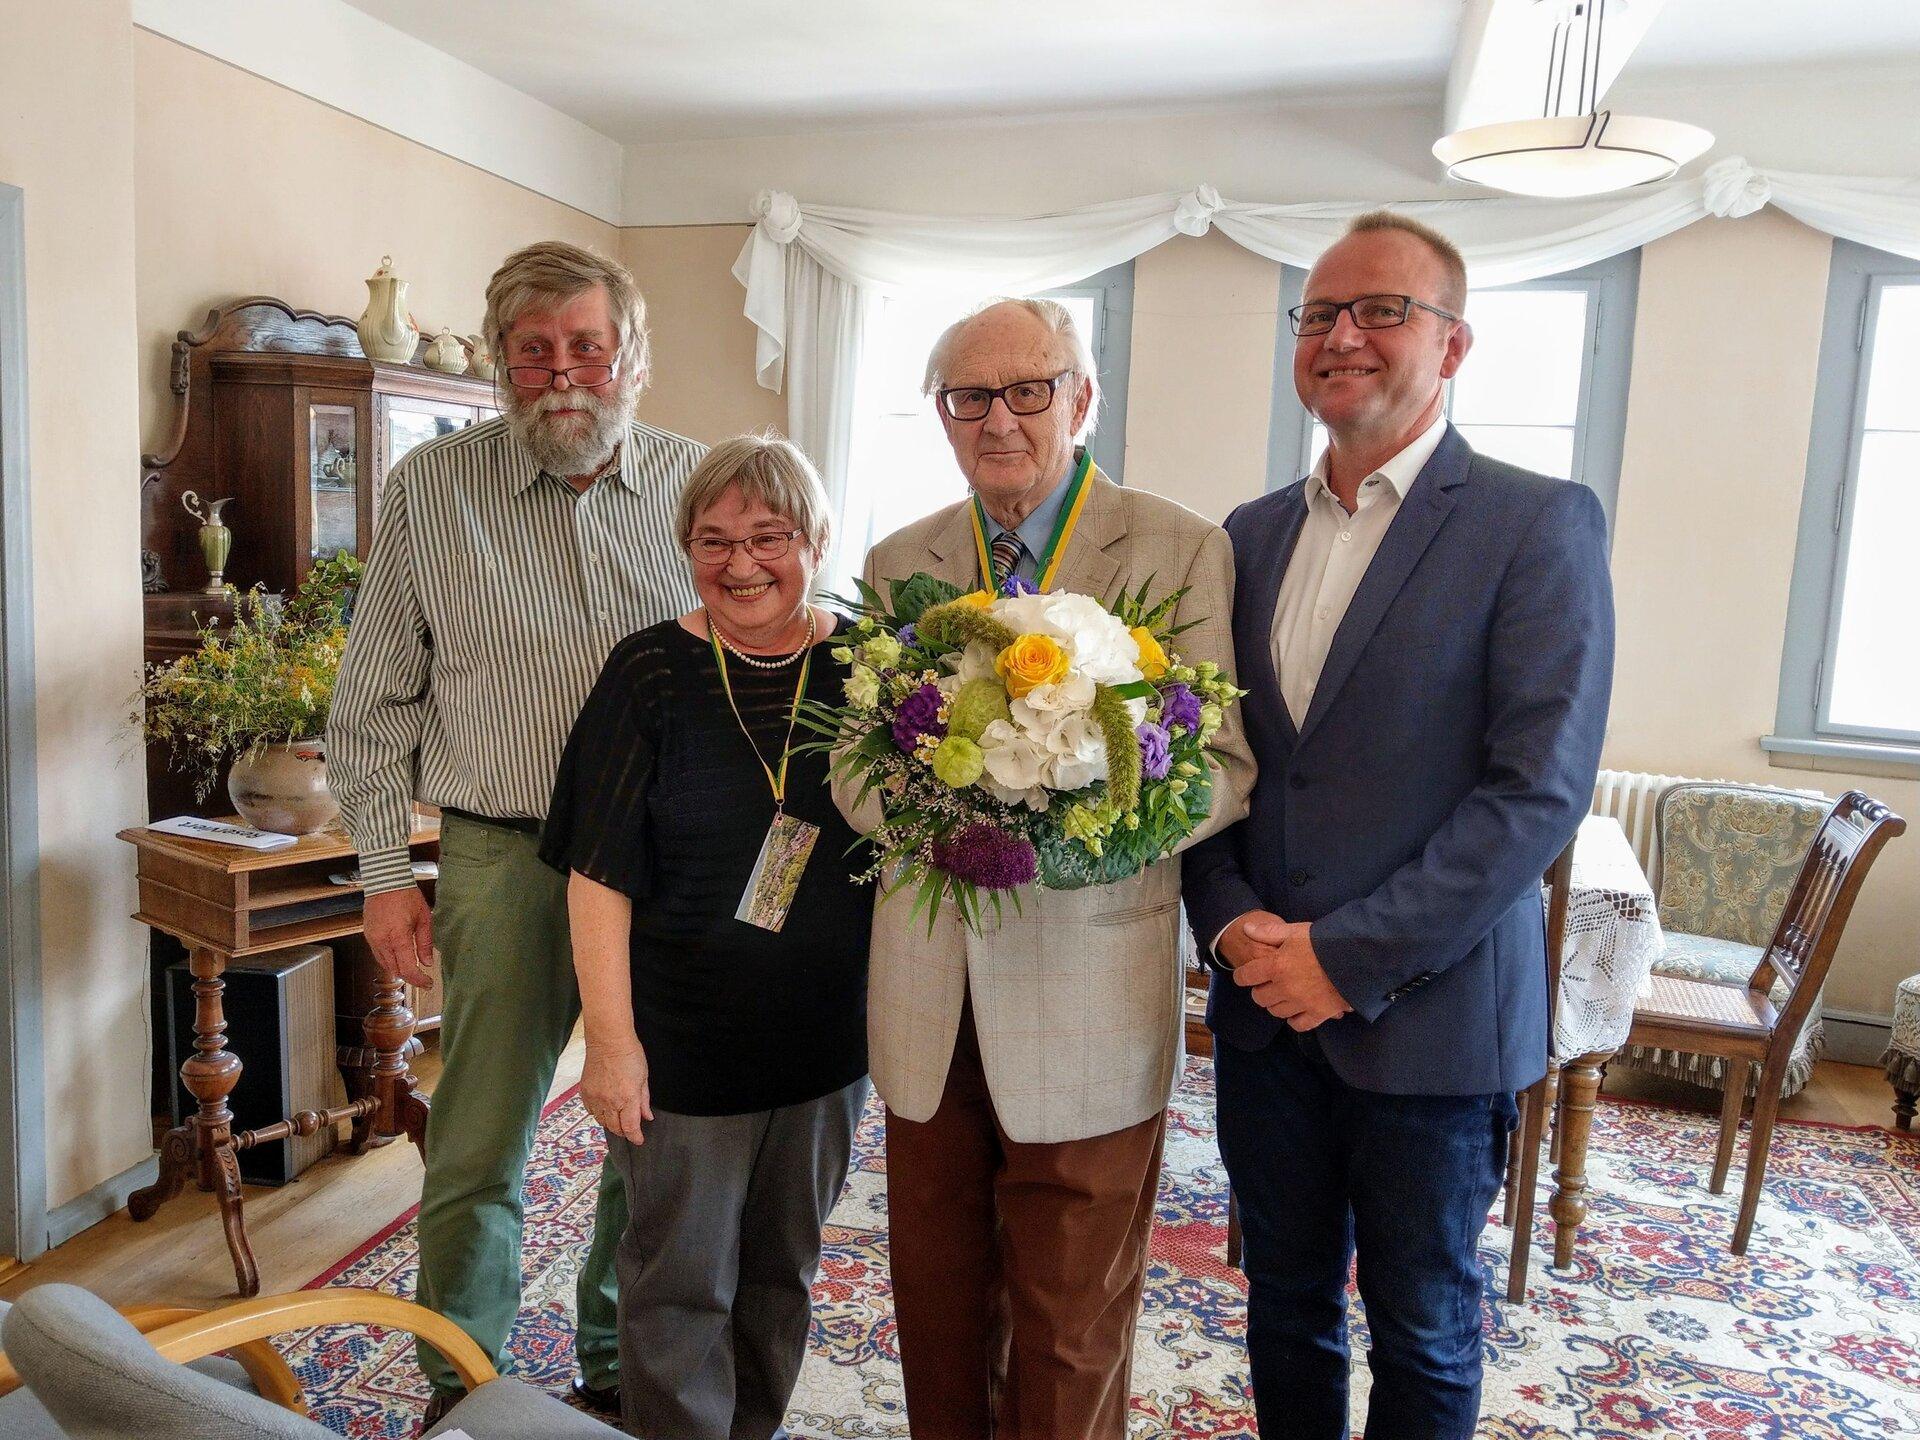 Verleihung der Ehrenbürgerschaft v.l.n.r. Dr. Otto Hahn, Helena Mühe, Prof. Hansgeorg Mühe, Enno Dörnfeld